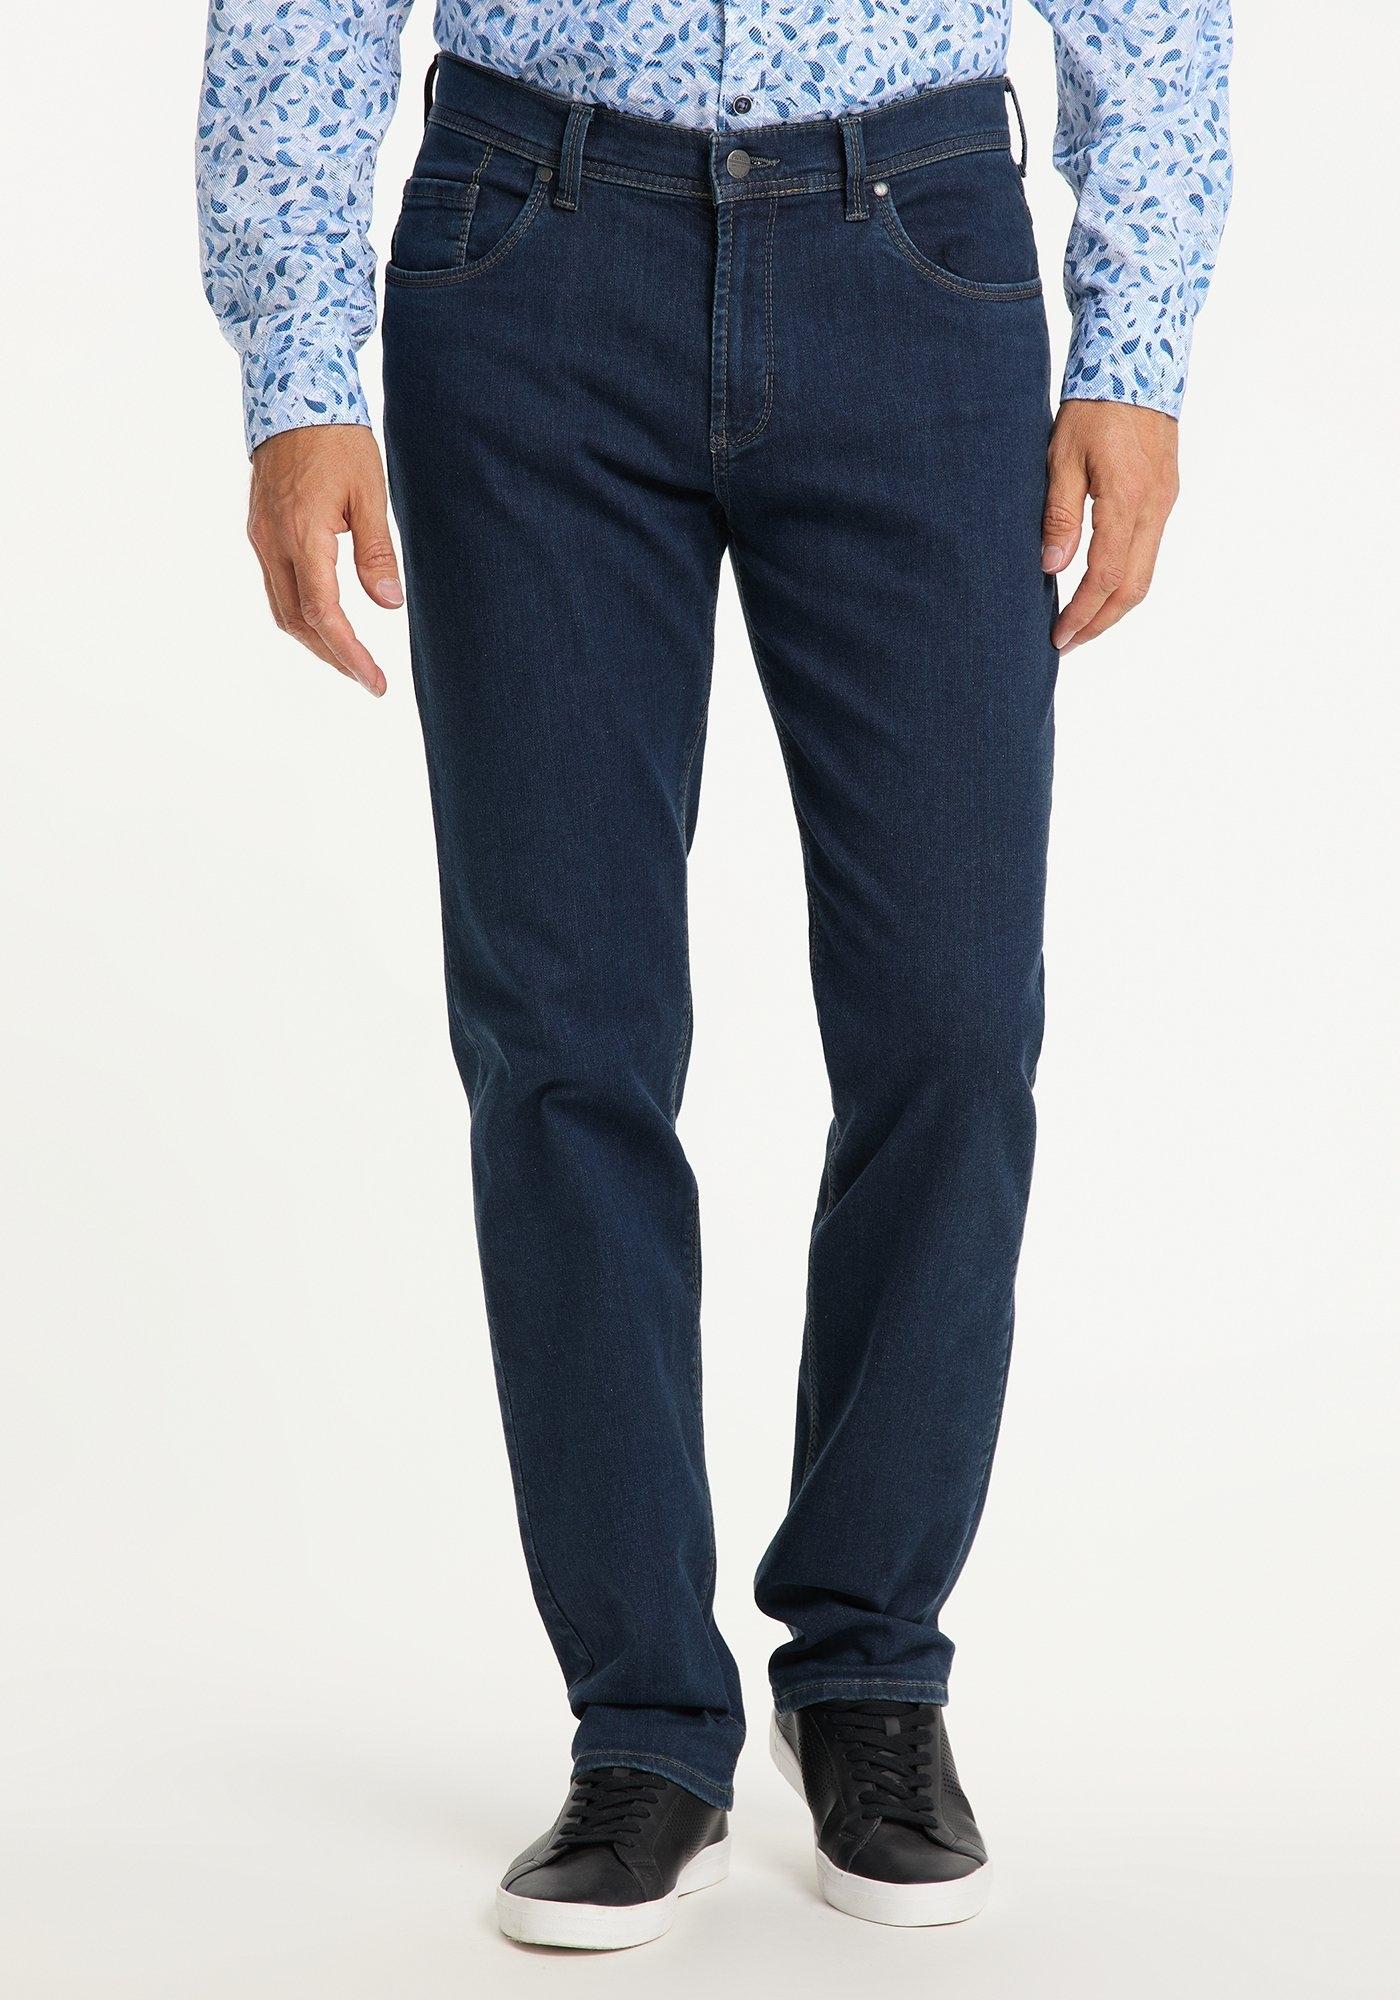 Pioneer Authentic Jeans 5-pocketsjeans »THOMAS HIGH PERFORMANCE Megaflex« veilig op otto.nl kopen